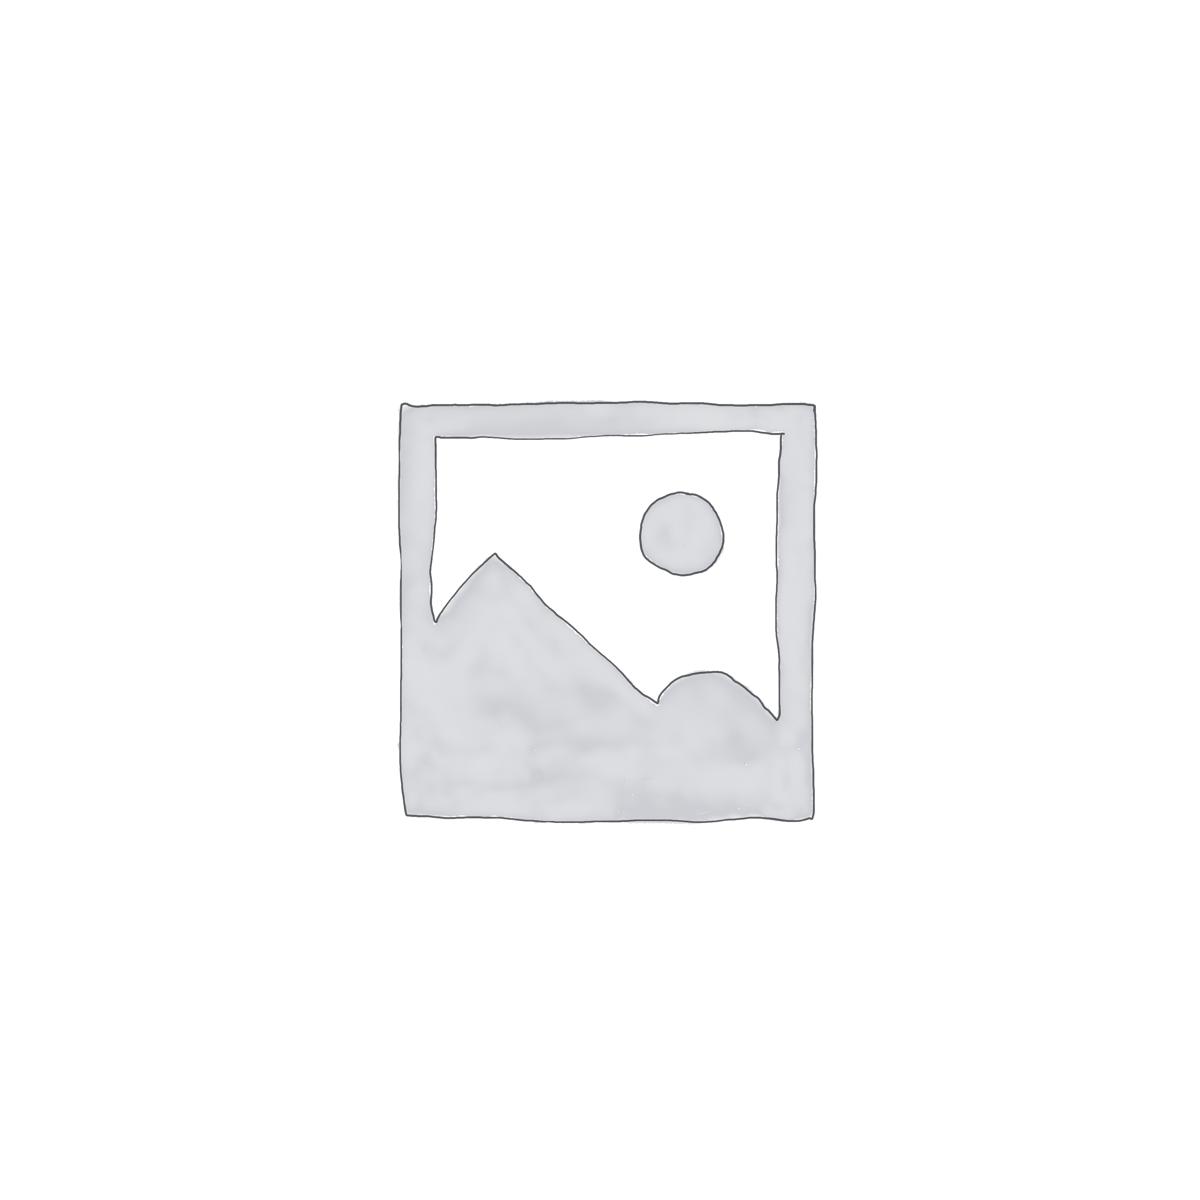 Charcoal City Wallpaper Mural